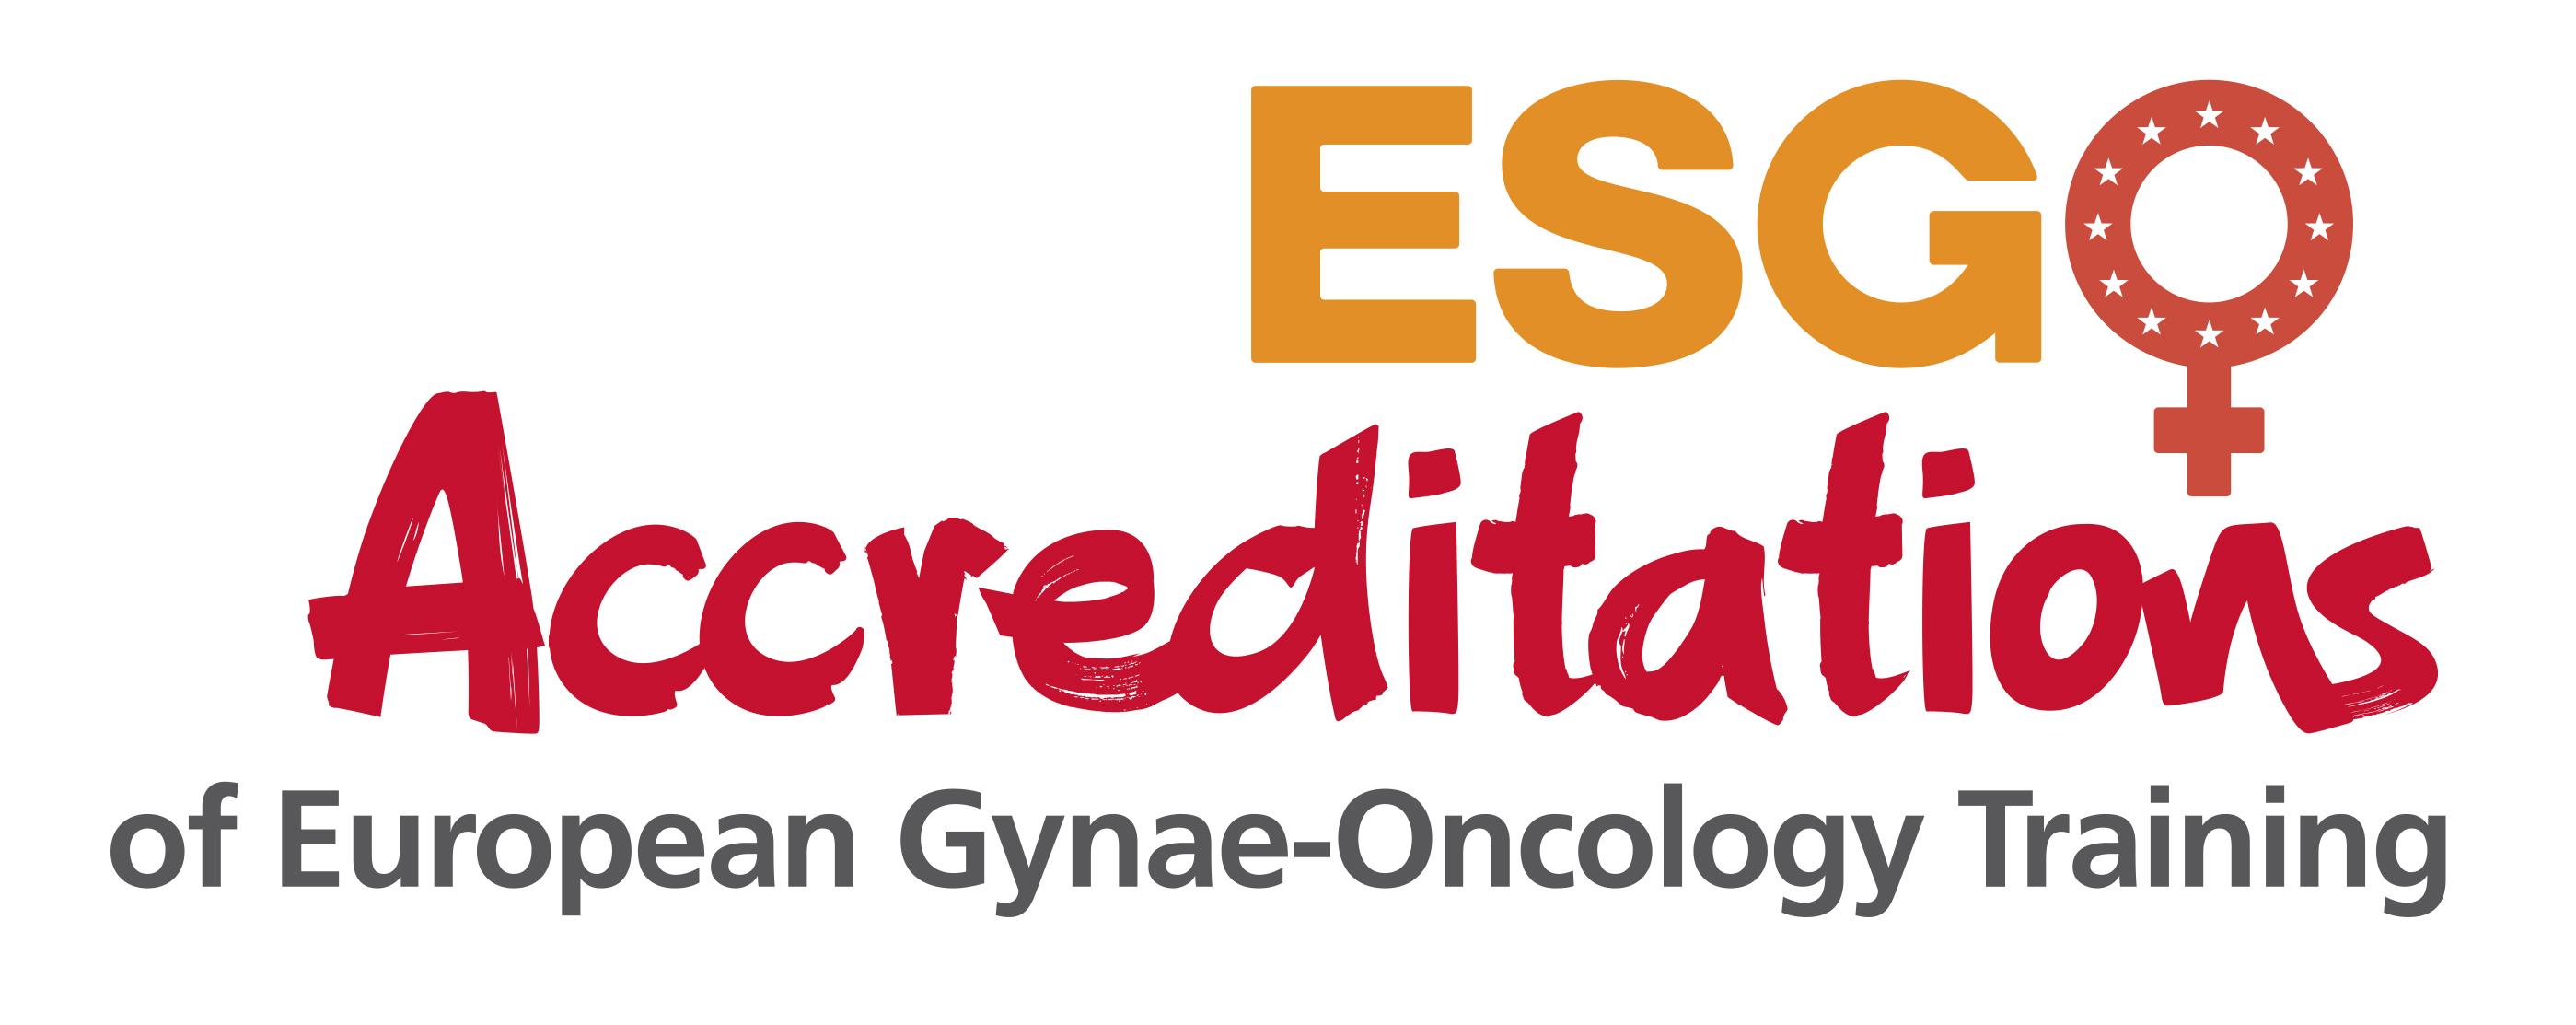 ESGO_accreditations_logo_V00